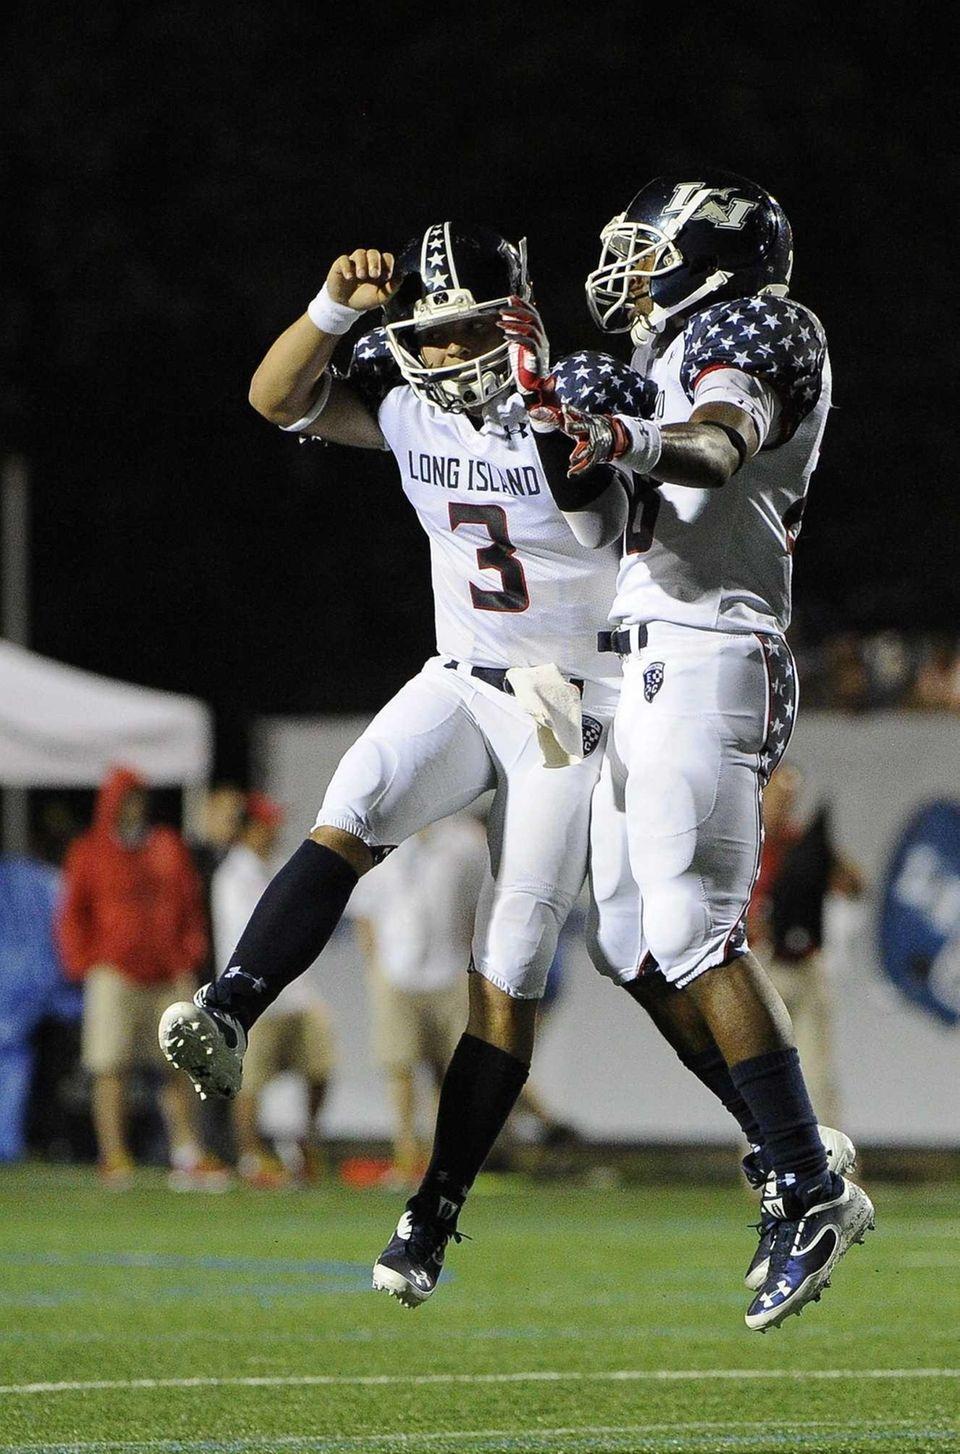 Long Island team quarterback A.J. Otranto, left, celebrates